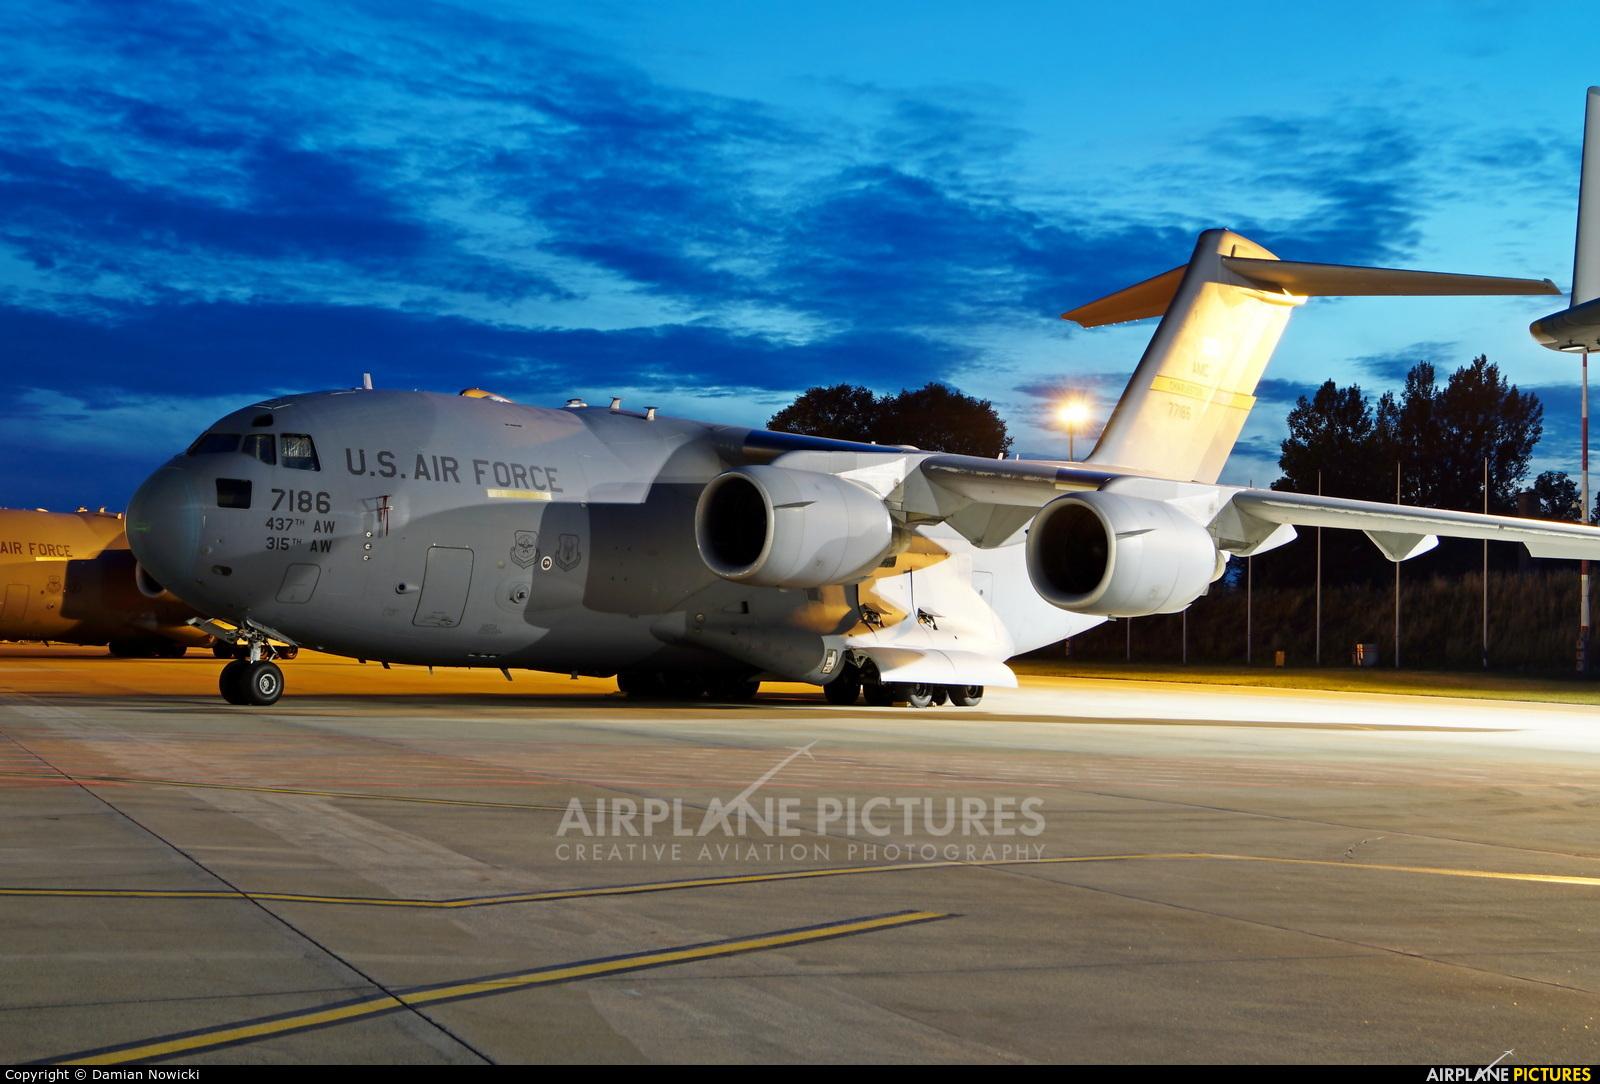 USA - Air Force 77186 aircraft at Wrocław - Copernicus